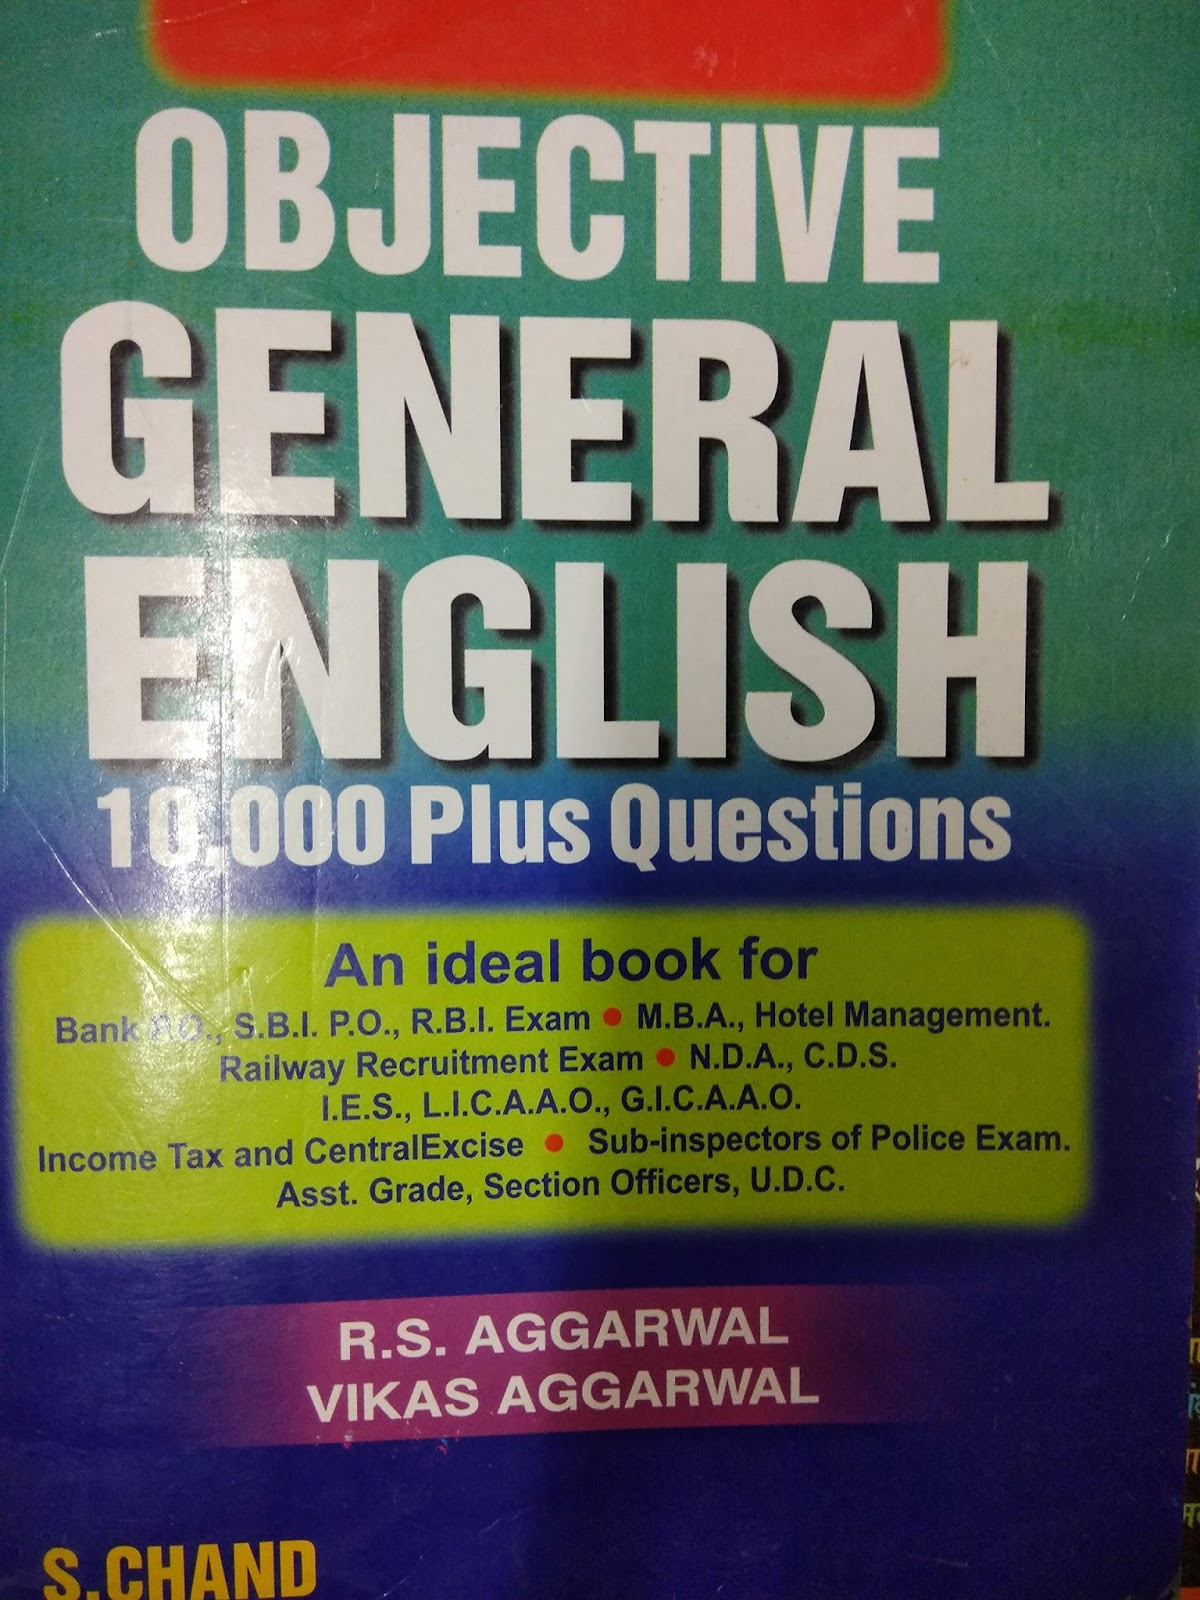 Objective General English Paperback By Sp Bakshi Pdf